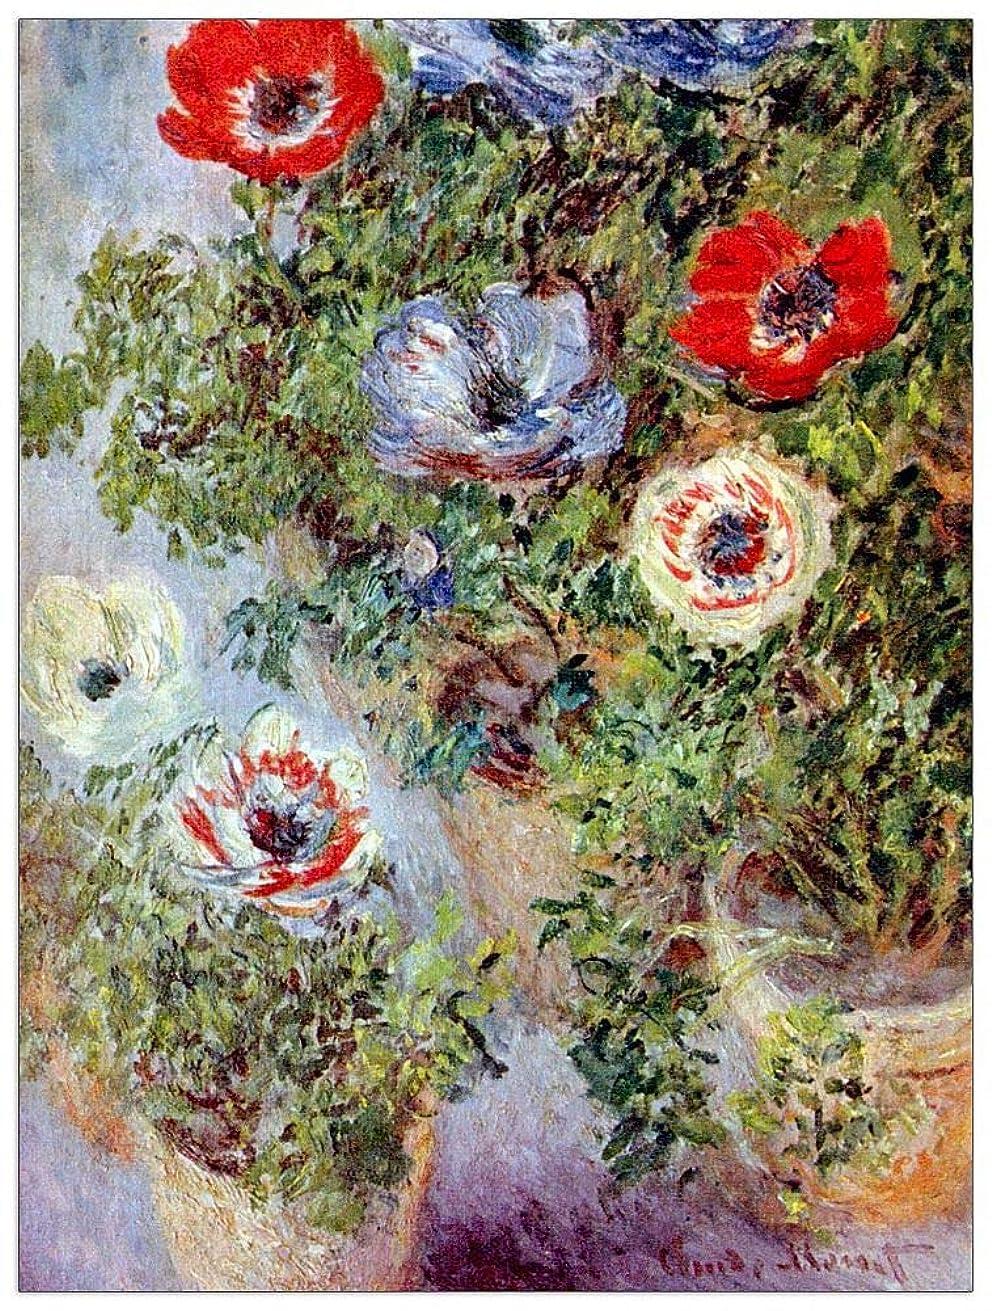 ArtPlaza TW91934 Monet Claude - Still Life with Anemones Decorative Panel 27.5x35.5 Inch Multicolored